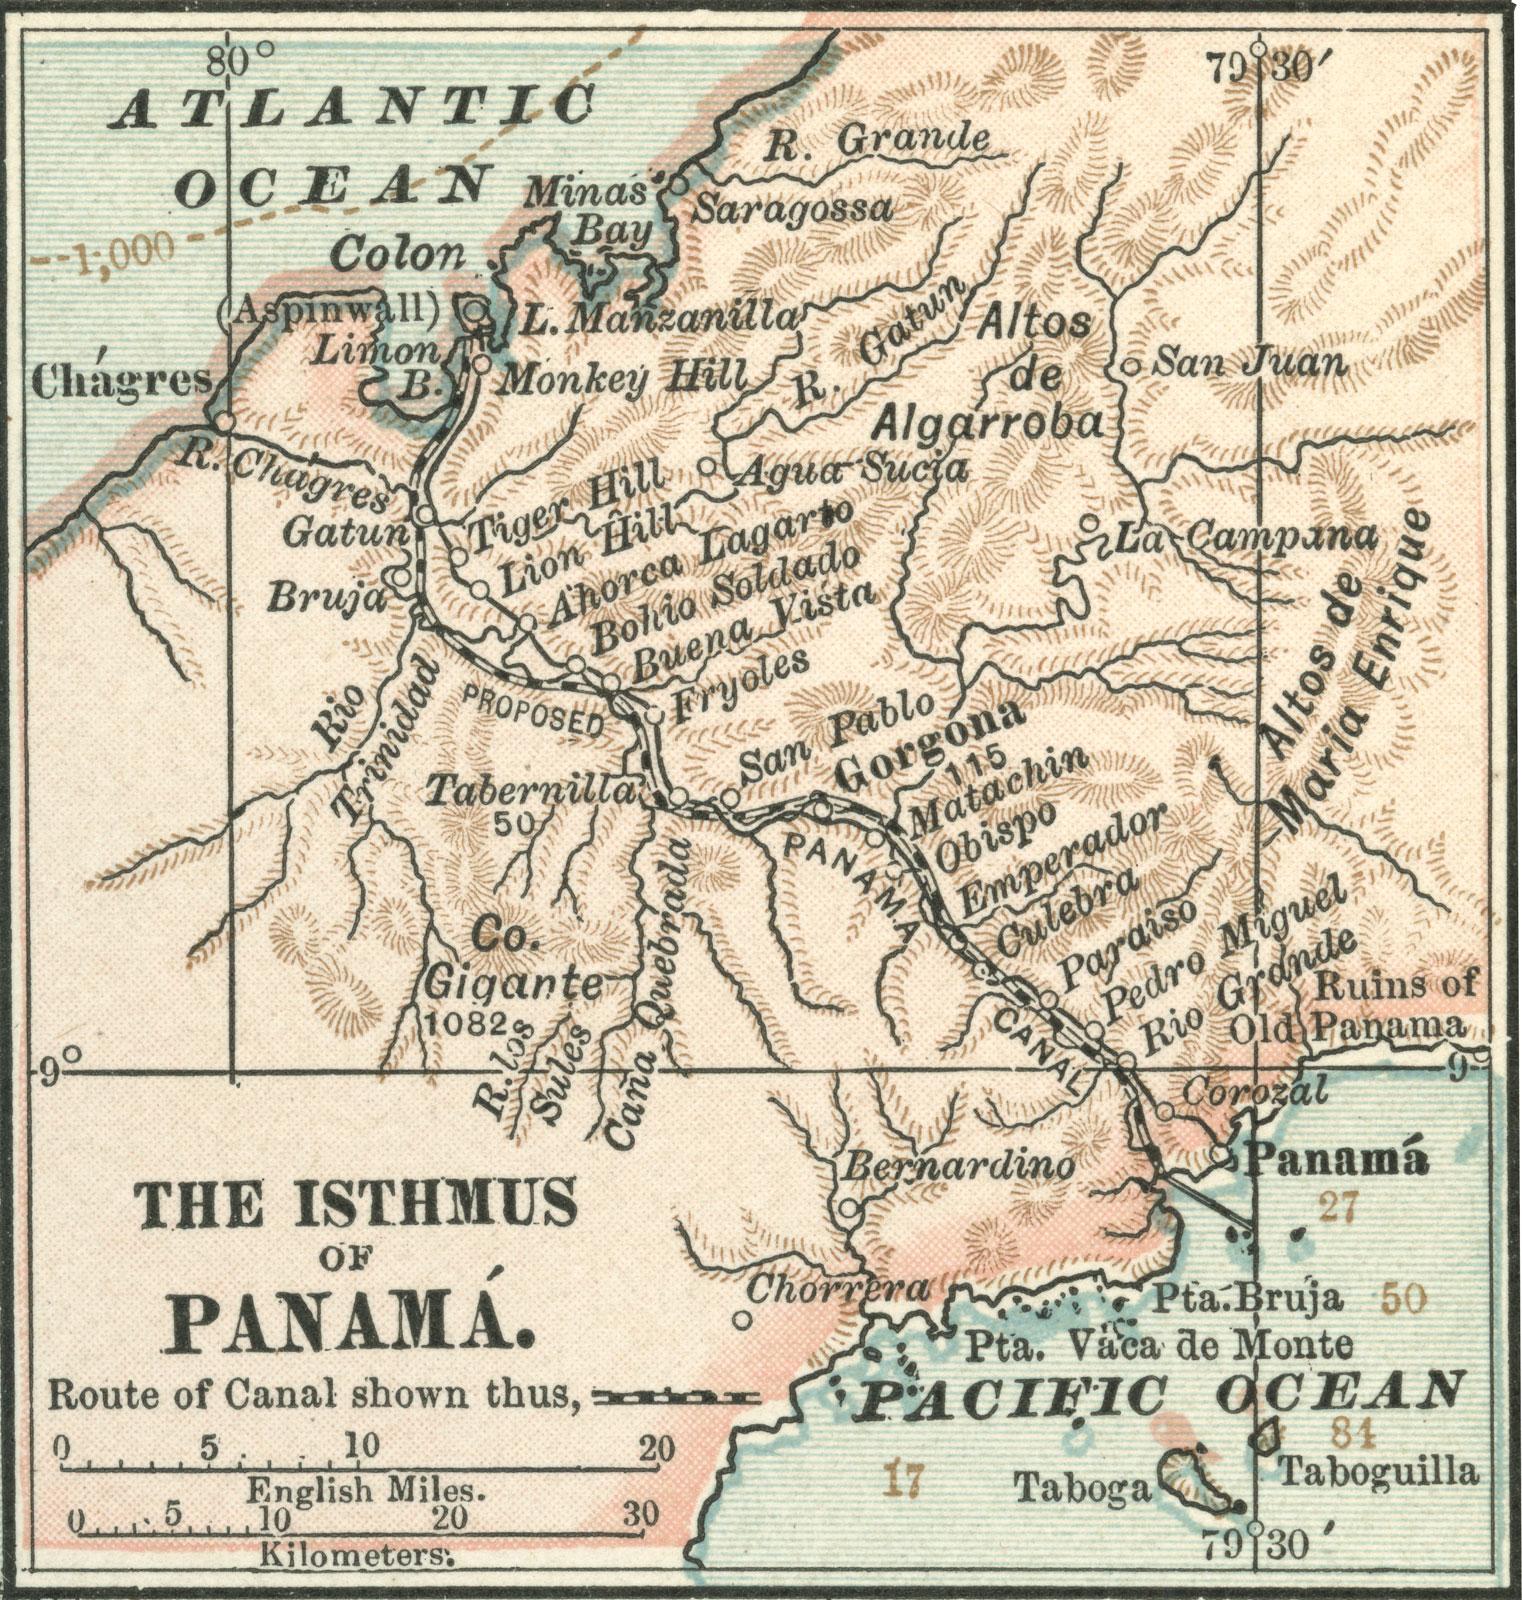 The isthmus of Panamá